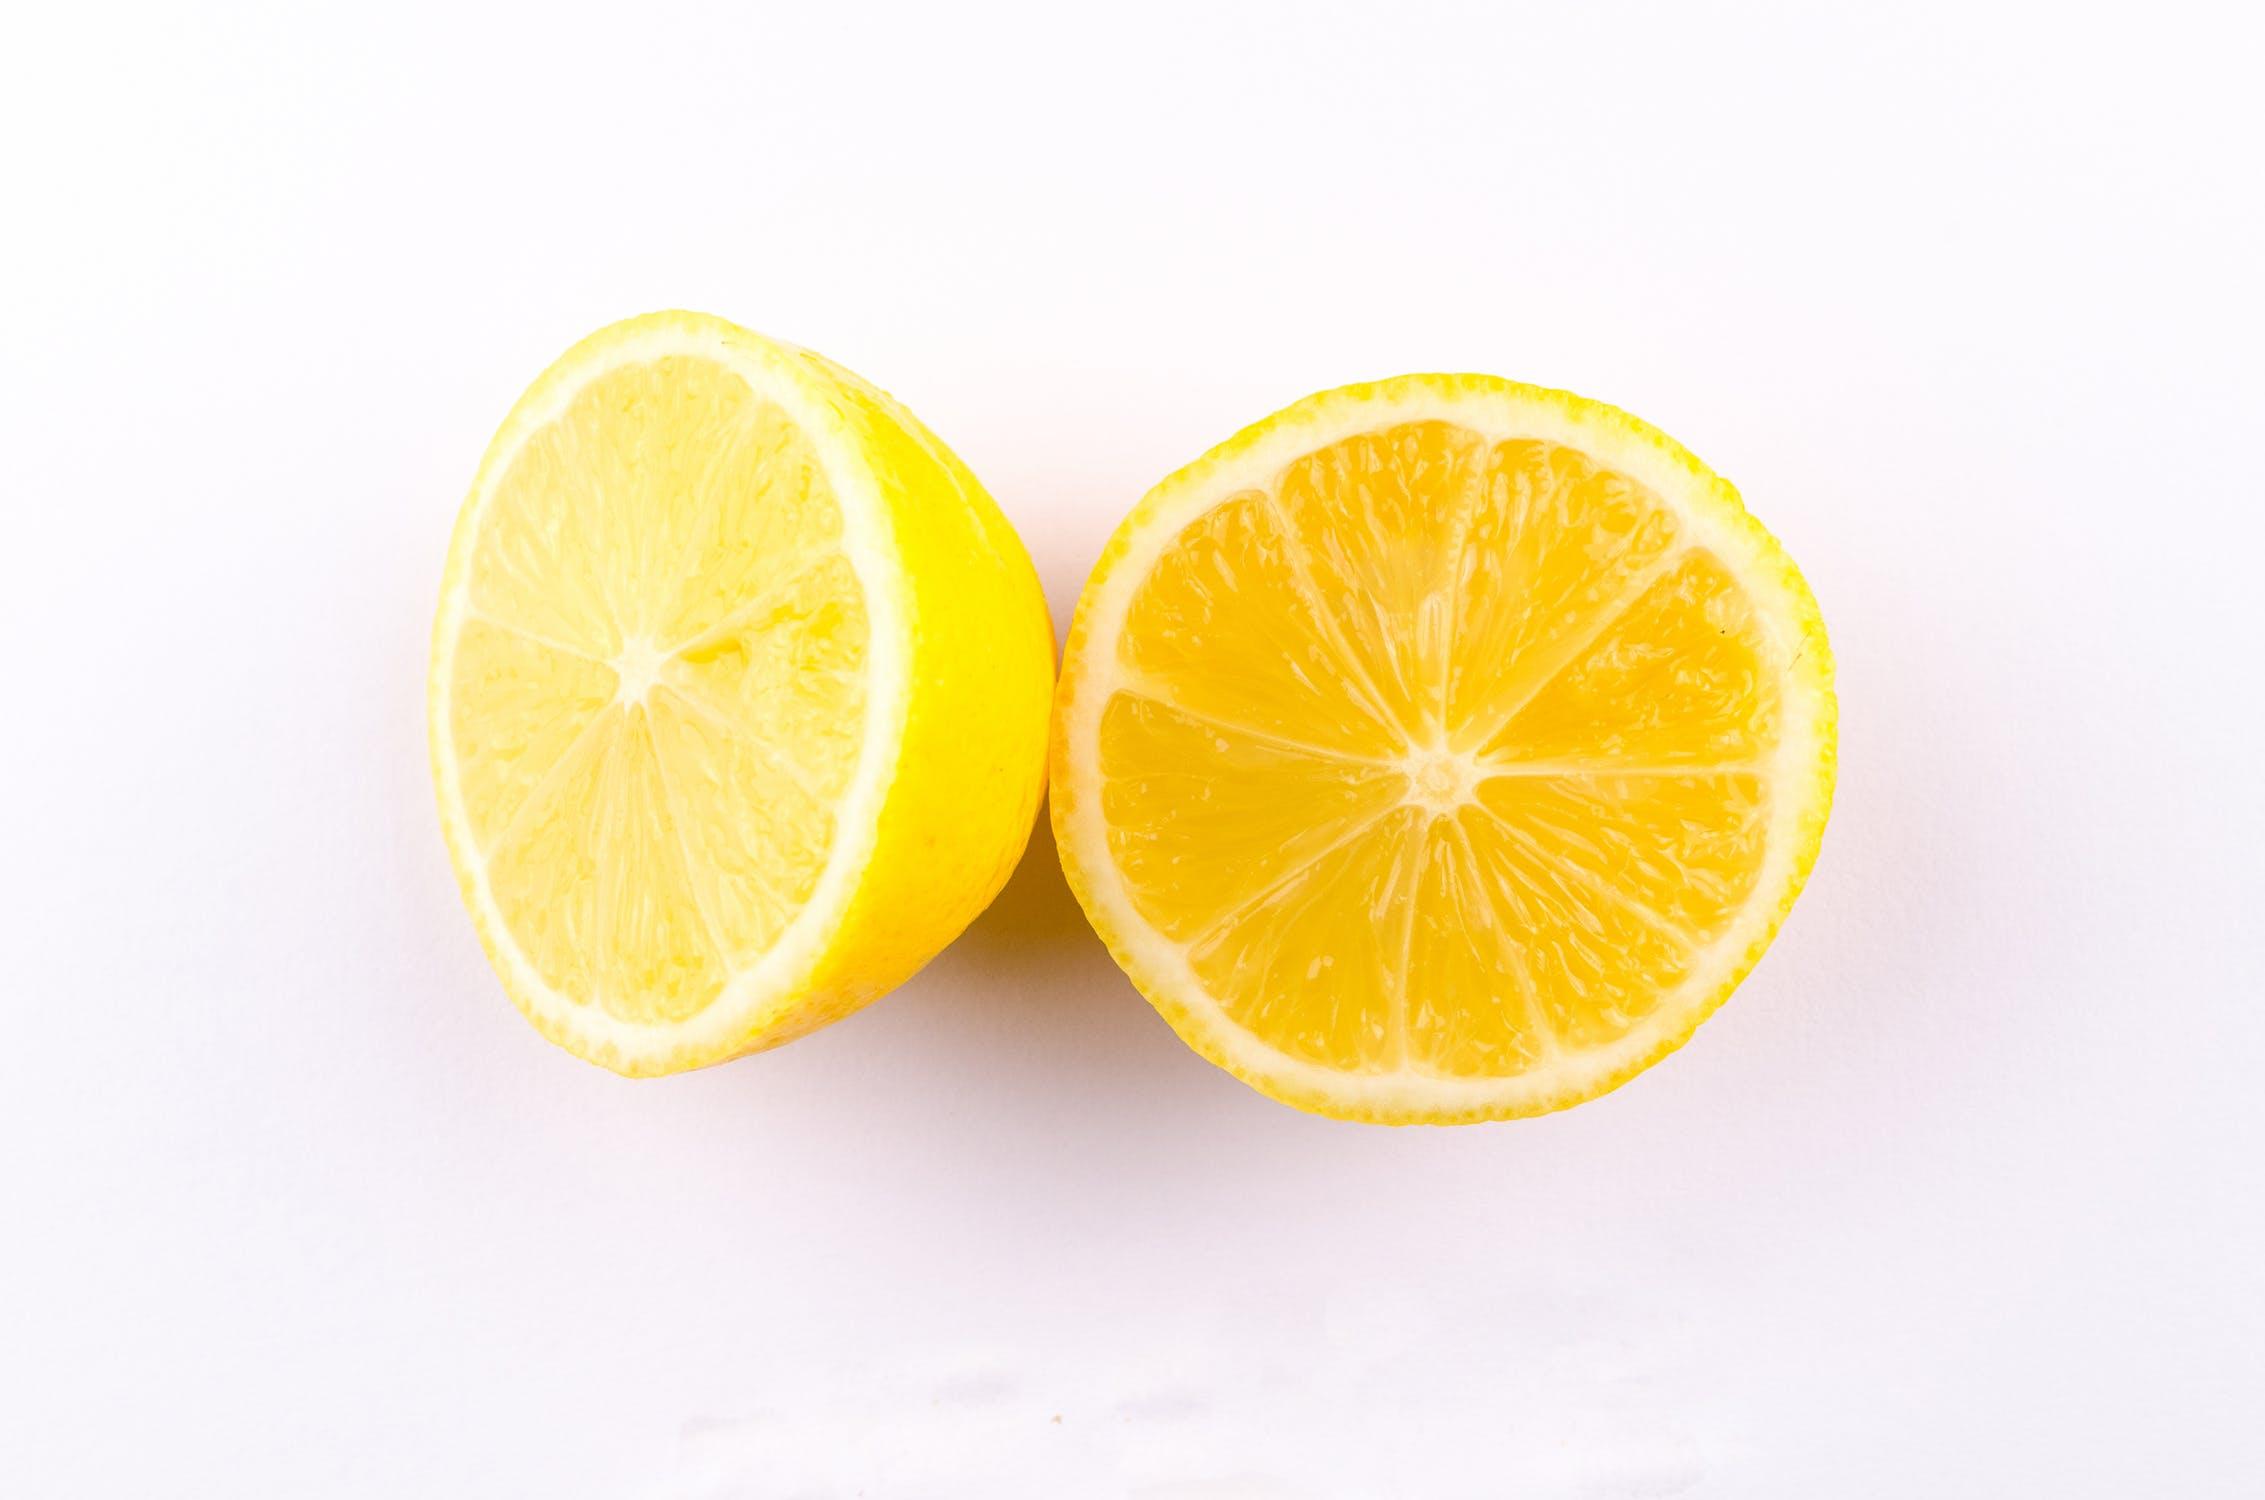 Beneficiile vitaminei C. Iata care sunt cele mai indicate alimente